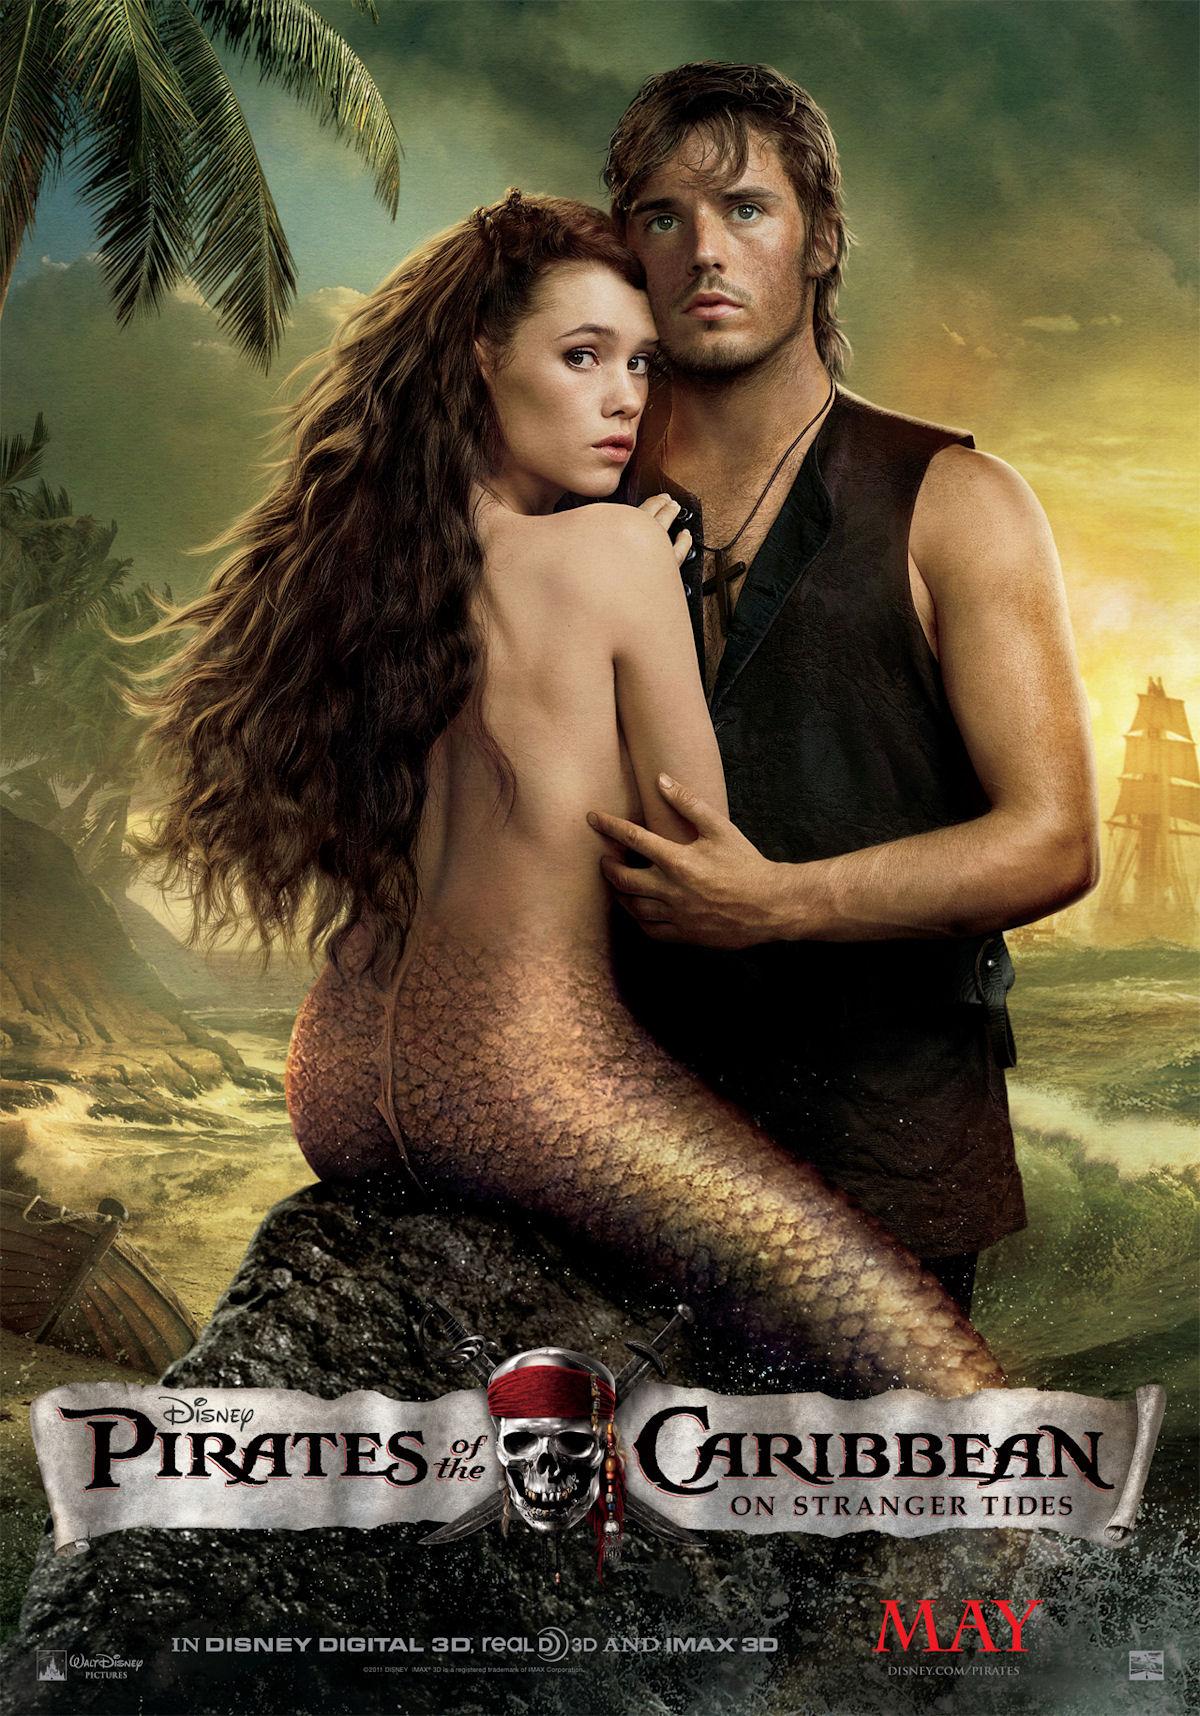 Pirates-Mermaid-Poster-1.jpg